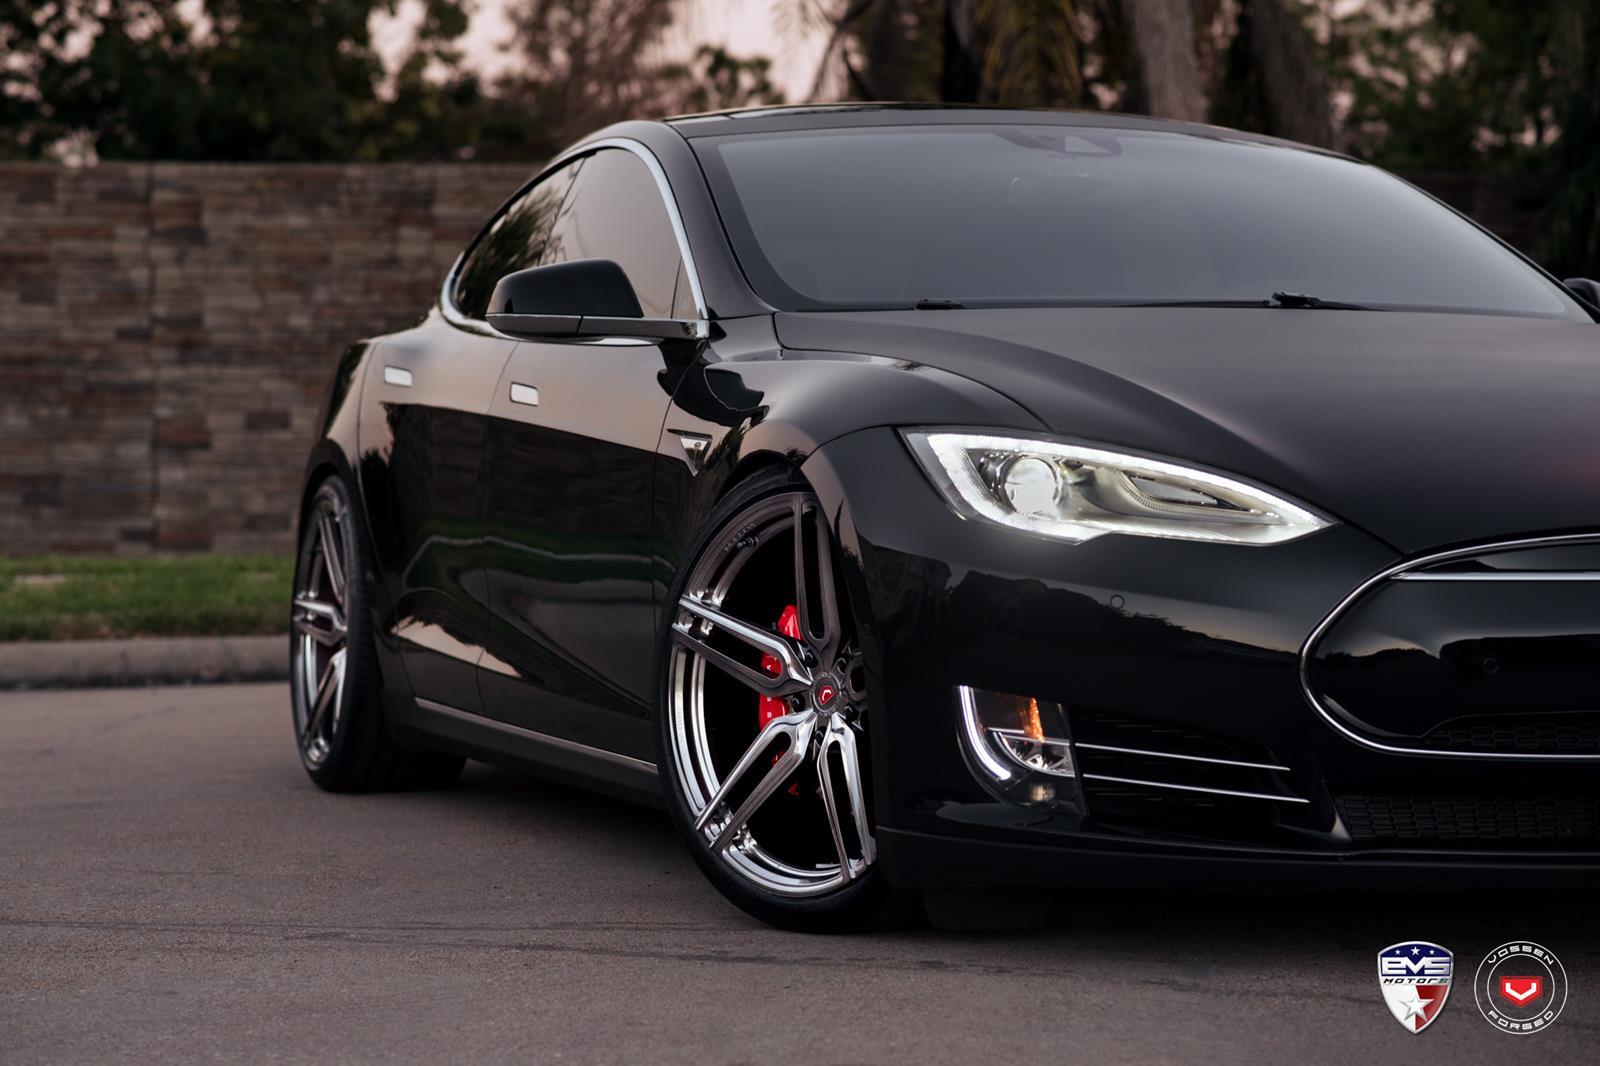 Tesla_Model S_HC-1_8acb0195.jpg